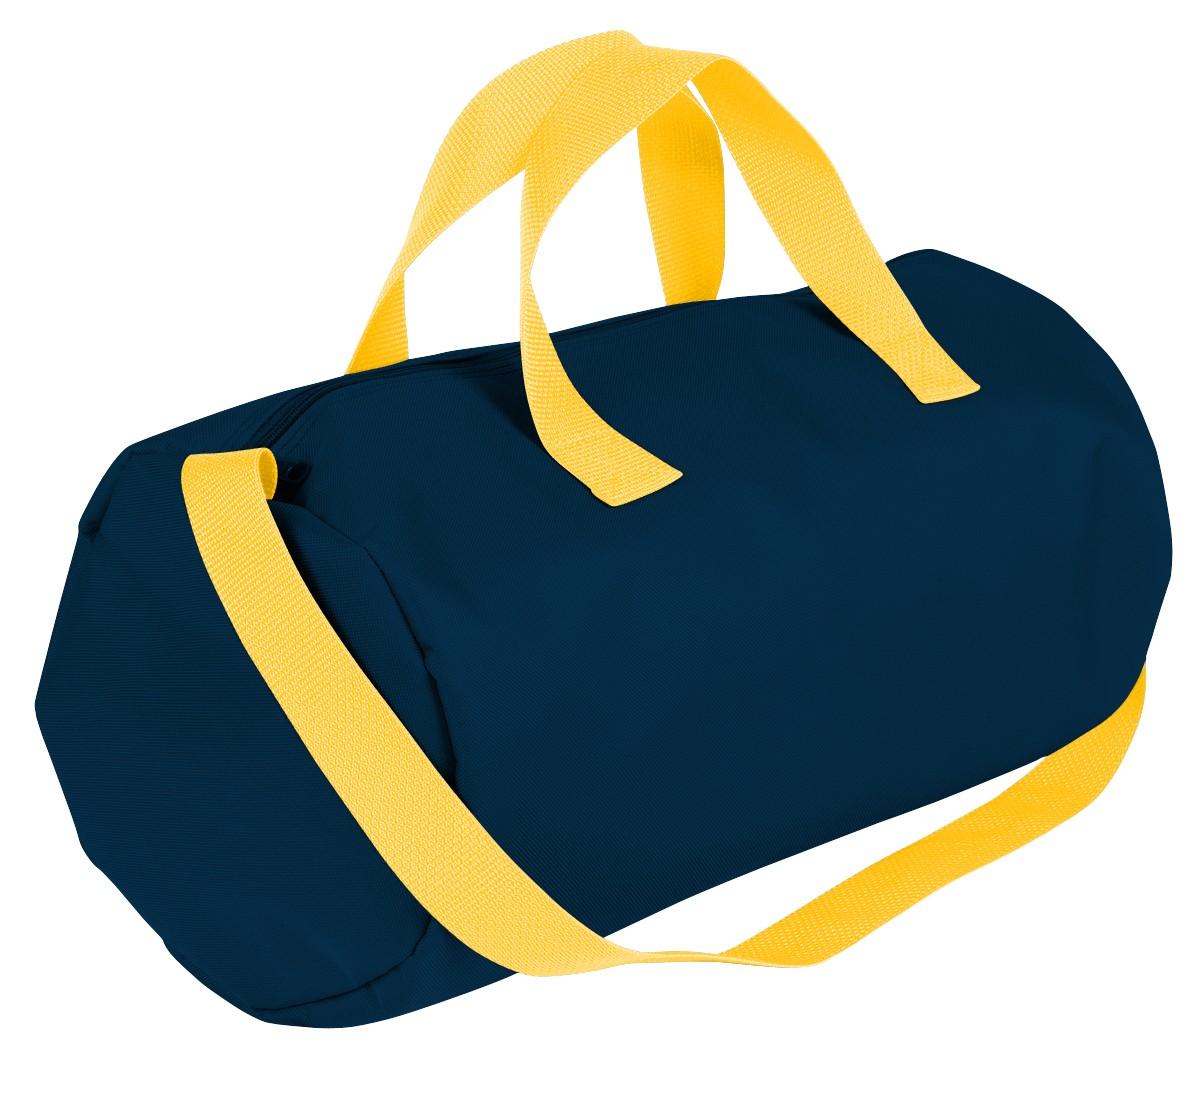 Free Gym Bag Cliparts, Download Free Clip Art, Free Clip Art.